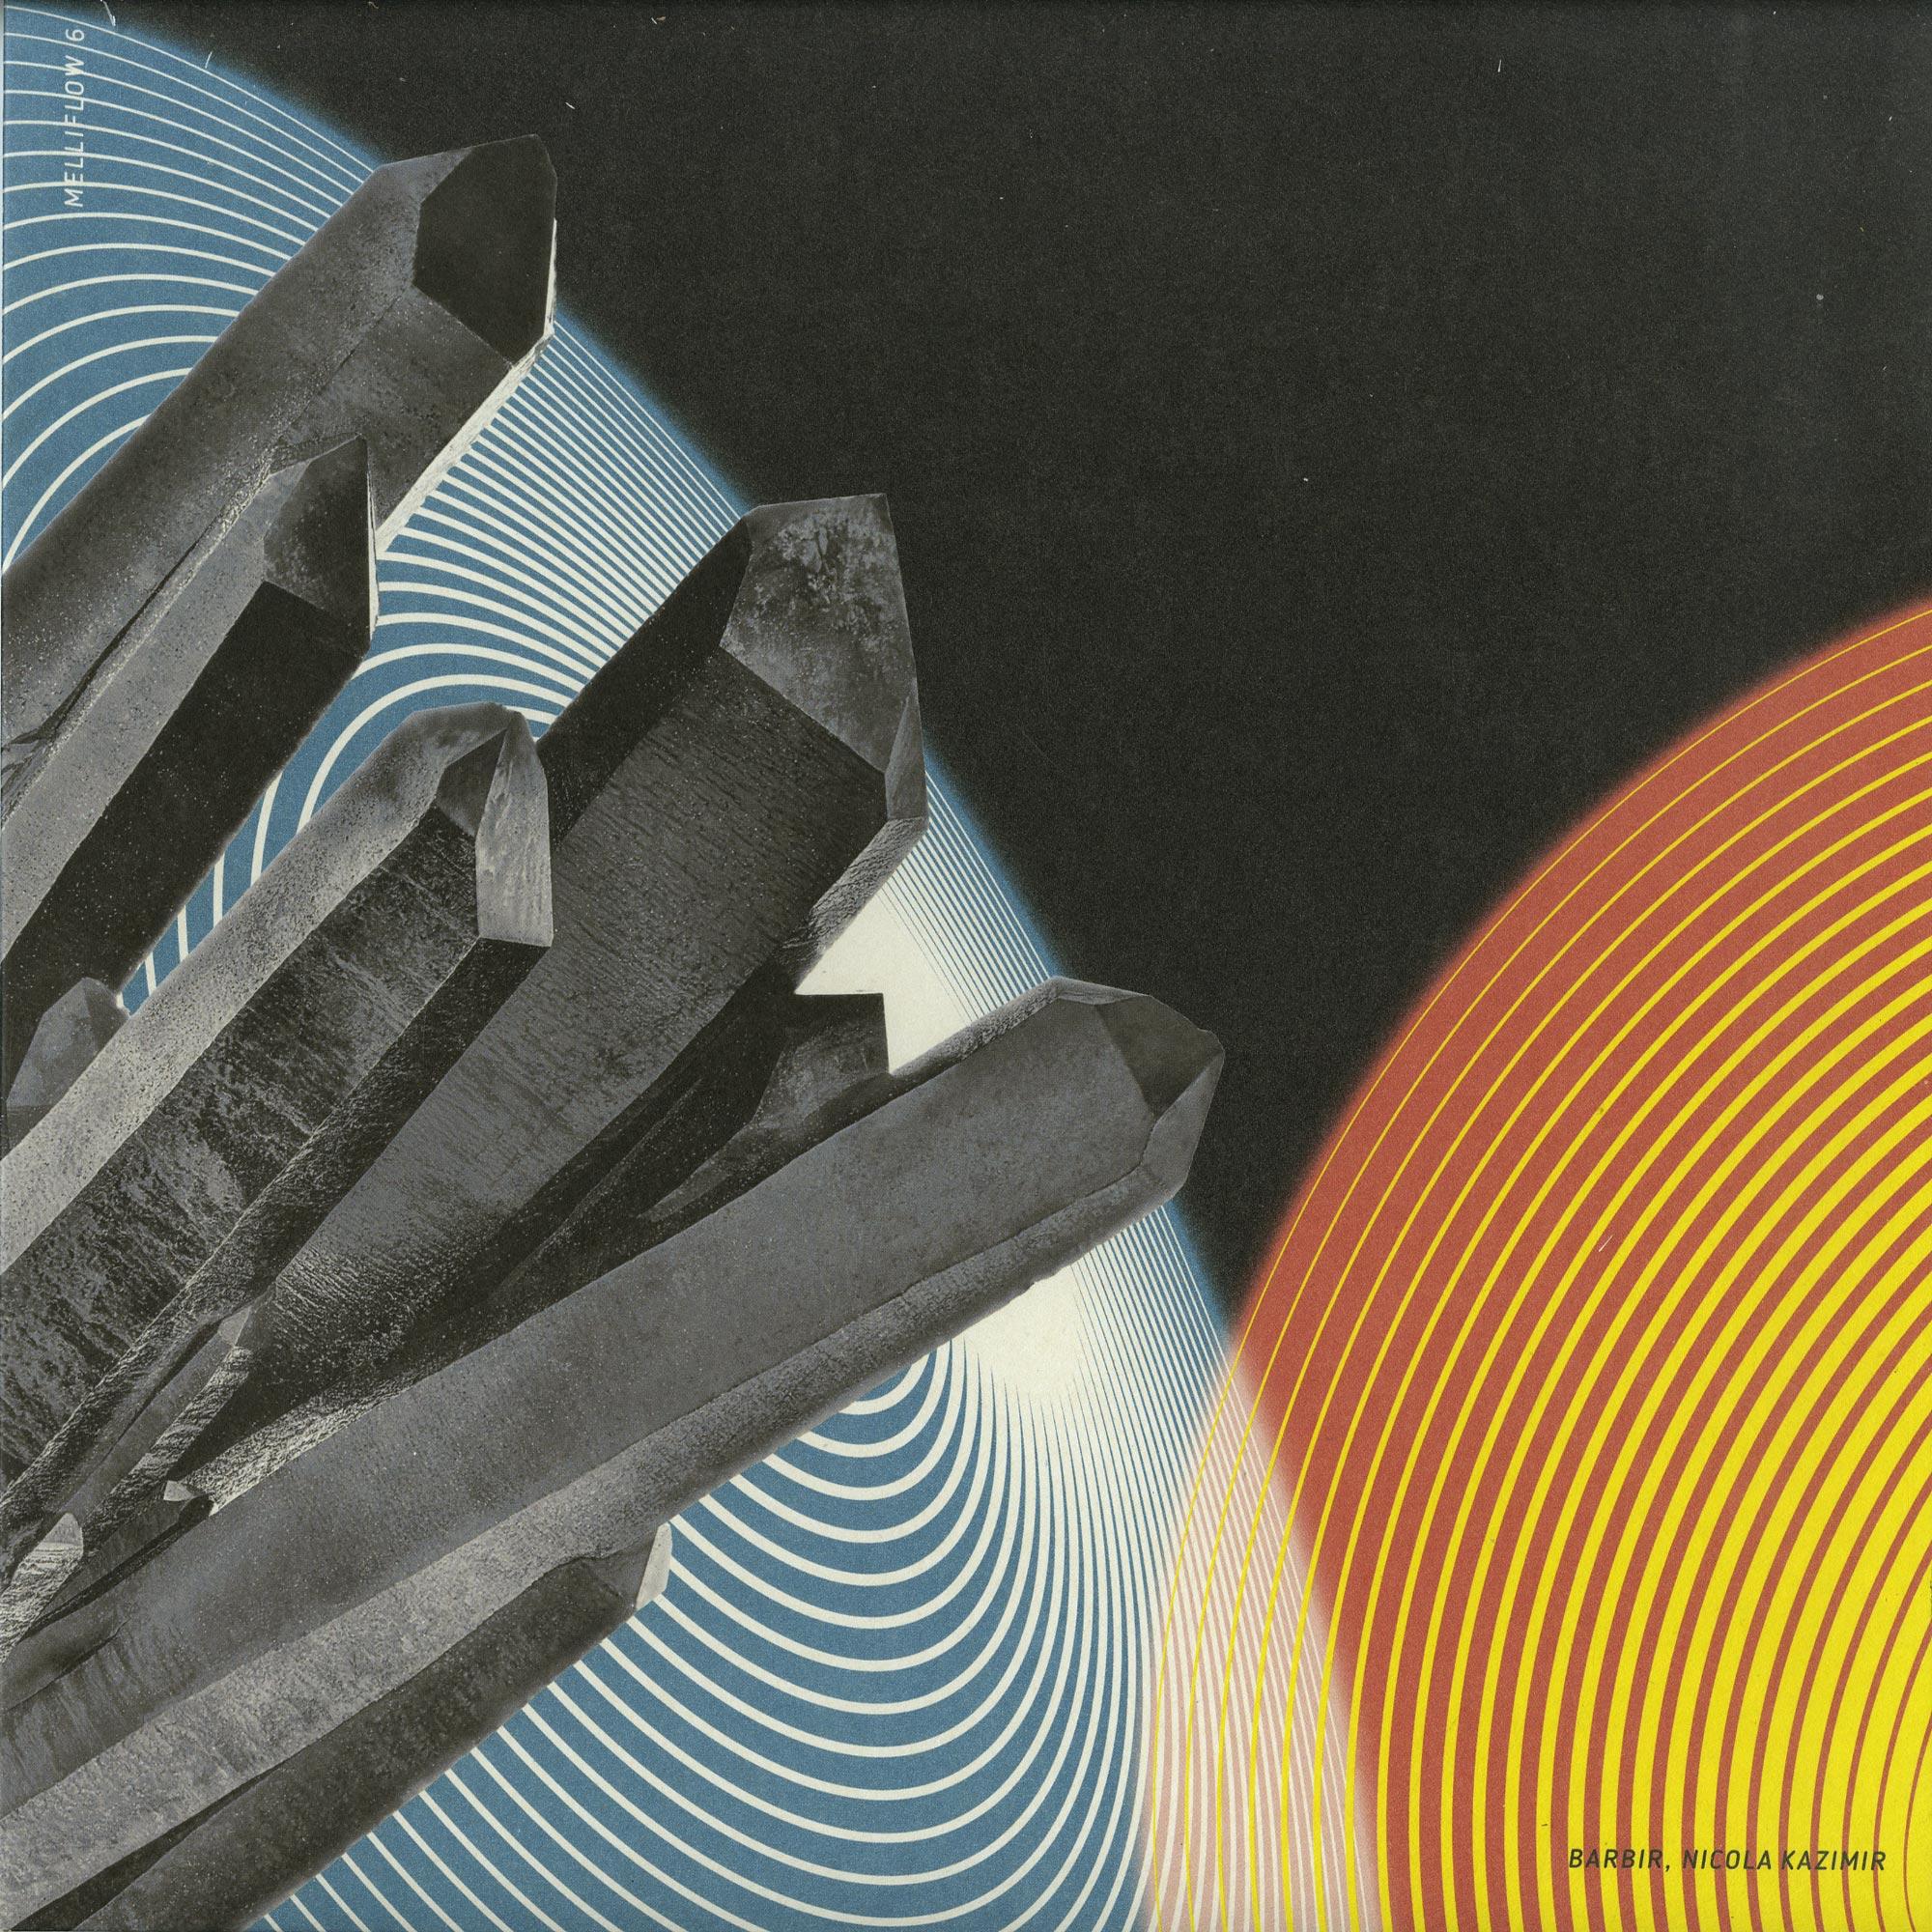 Barbir & Nicola Kazimir - REHASHING CYBERMAZE VR 1.1 EP